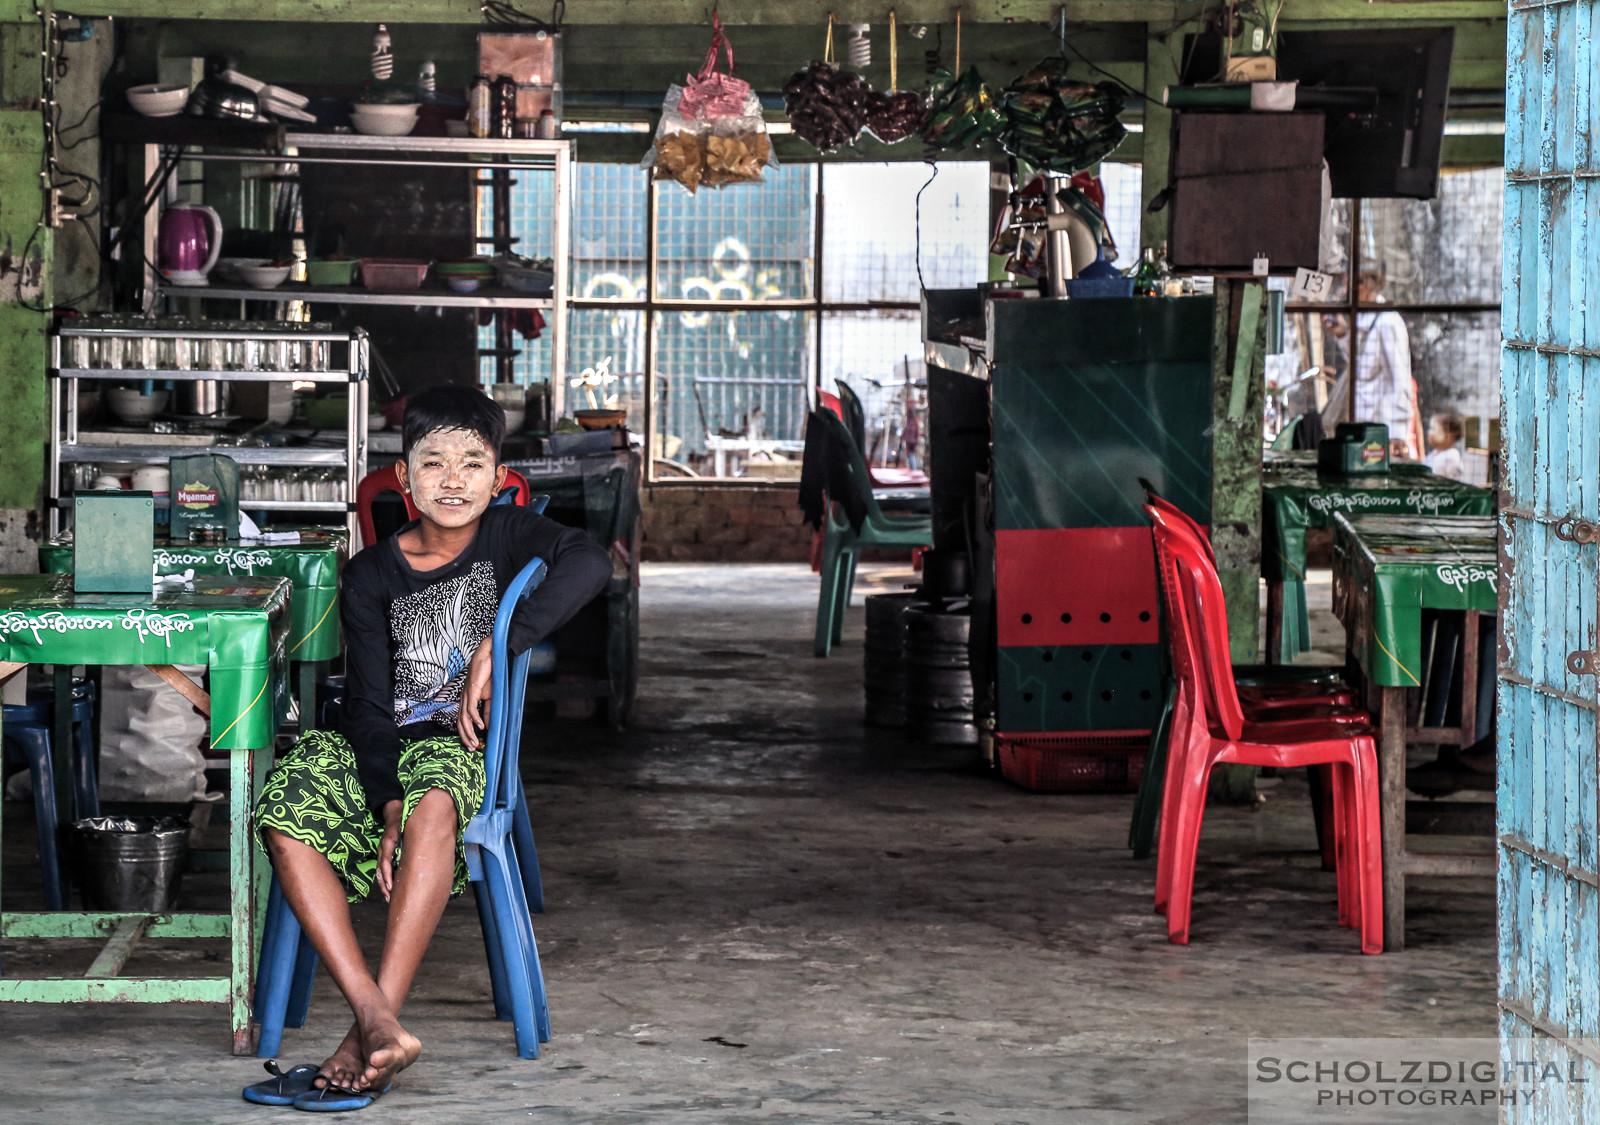 Shop, Myanmar, Travelling,Asia, Bagan, Birma, Burma, Exploring, globetrotter, Boy, Yangon, Southeastasia, Streetphotography, travel, Travelling, travelphotography, Wanderlust